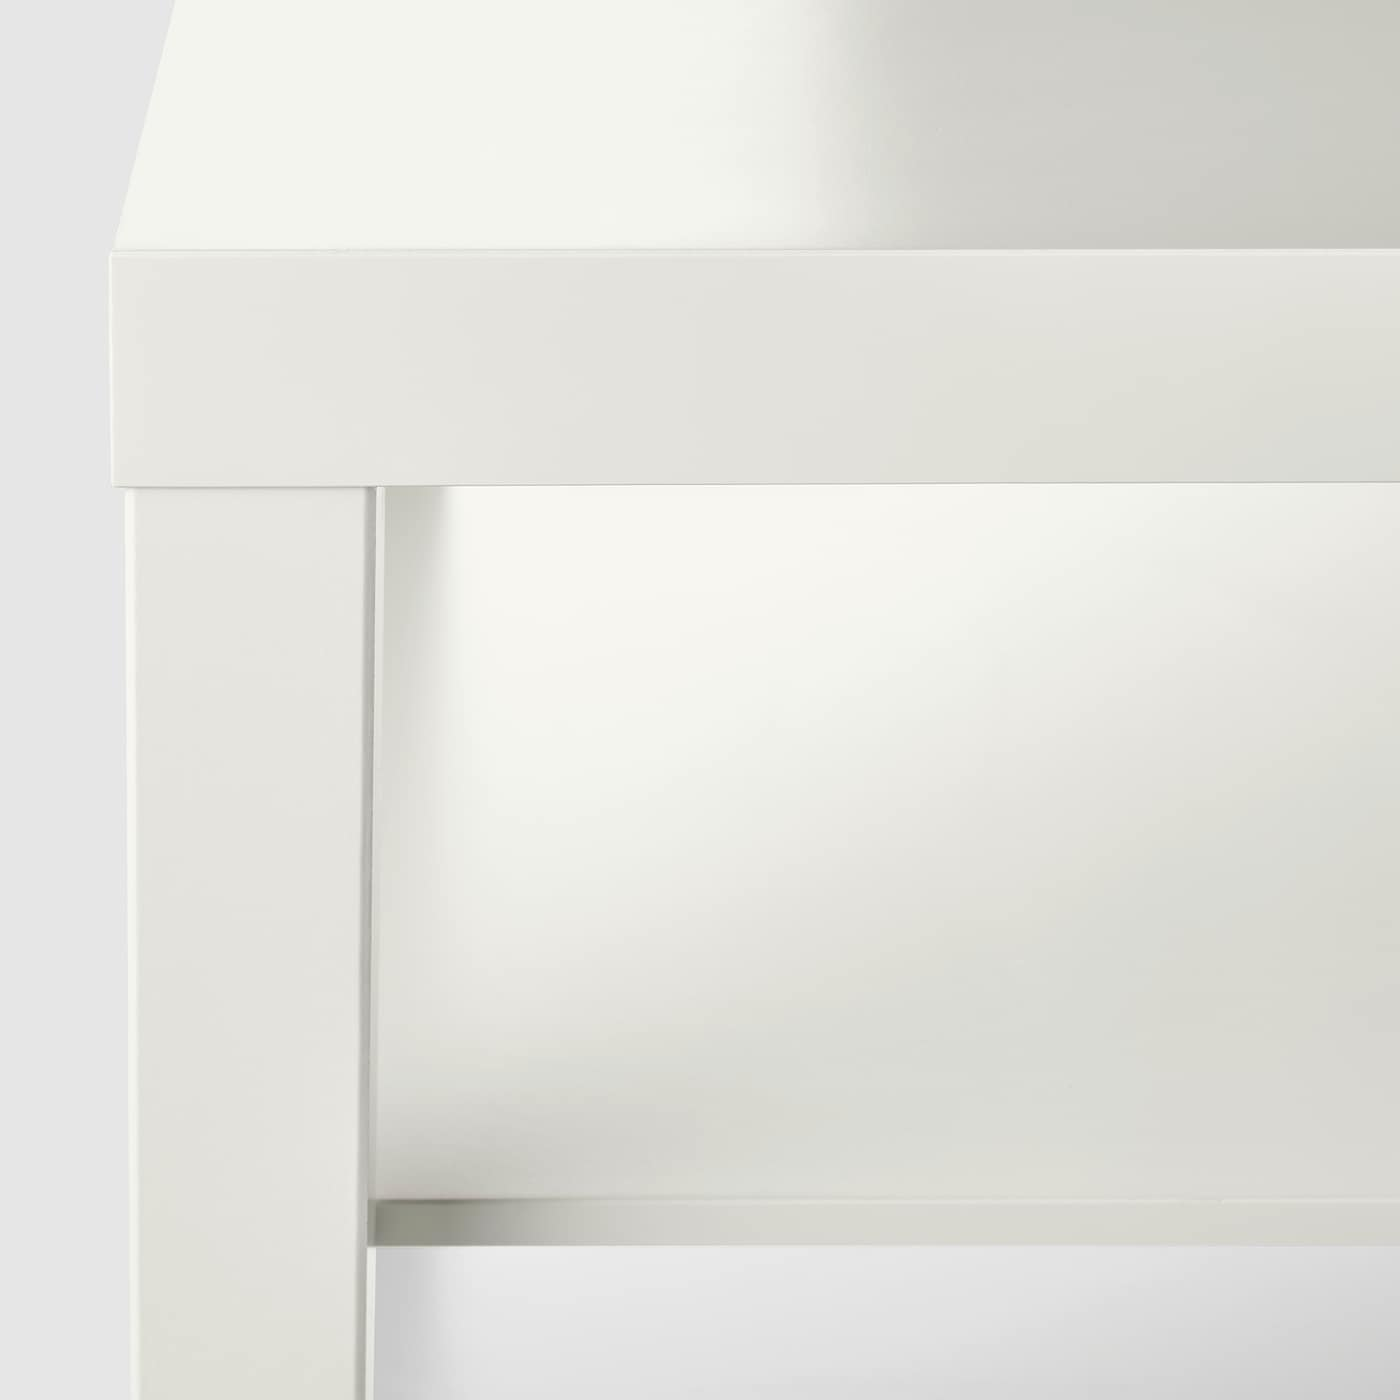 Lack Konferencni Stolek Bila 118x78 Cm Ikea [ 1400 x 1400 Pixel ]